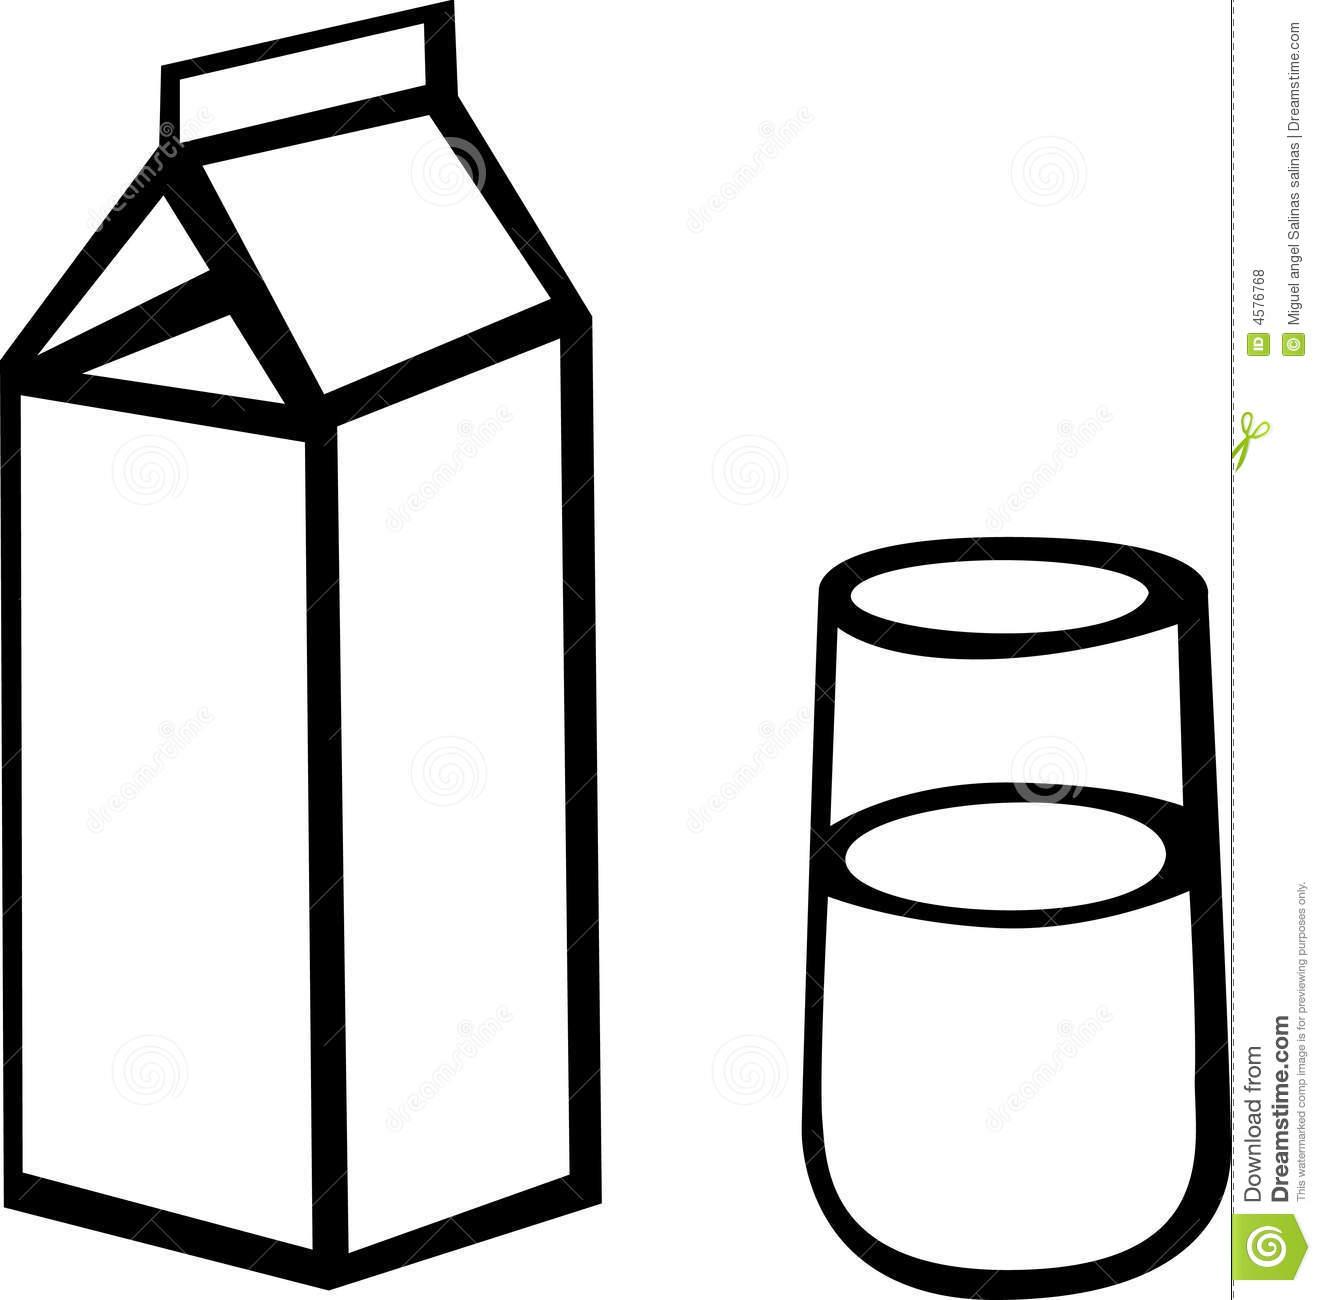 1321x1300 Milk Carton Clipart Many Interesting Cliparts